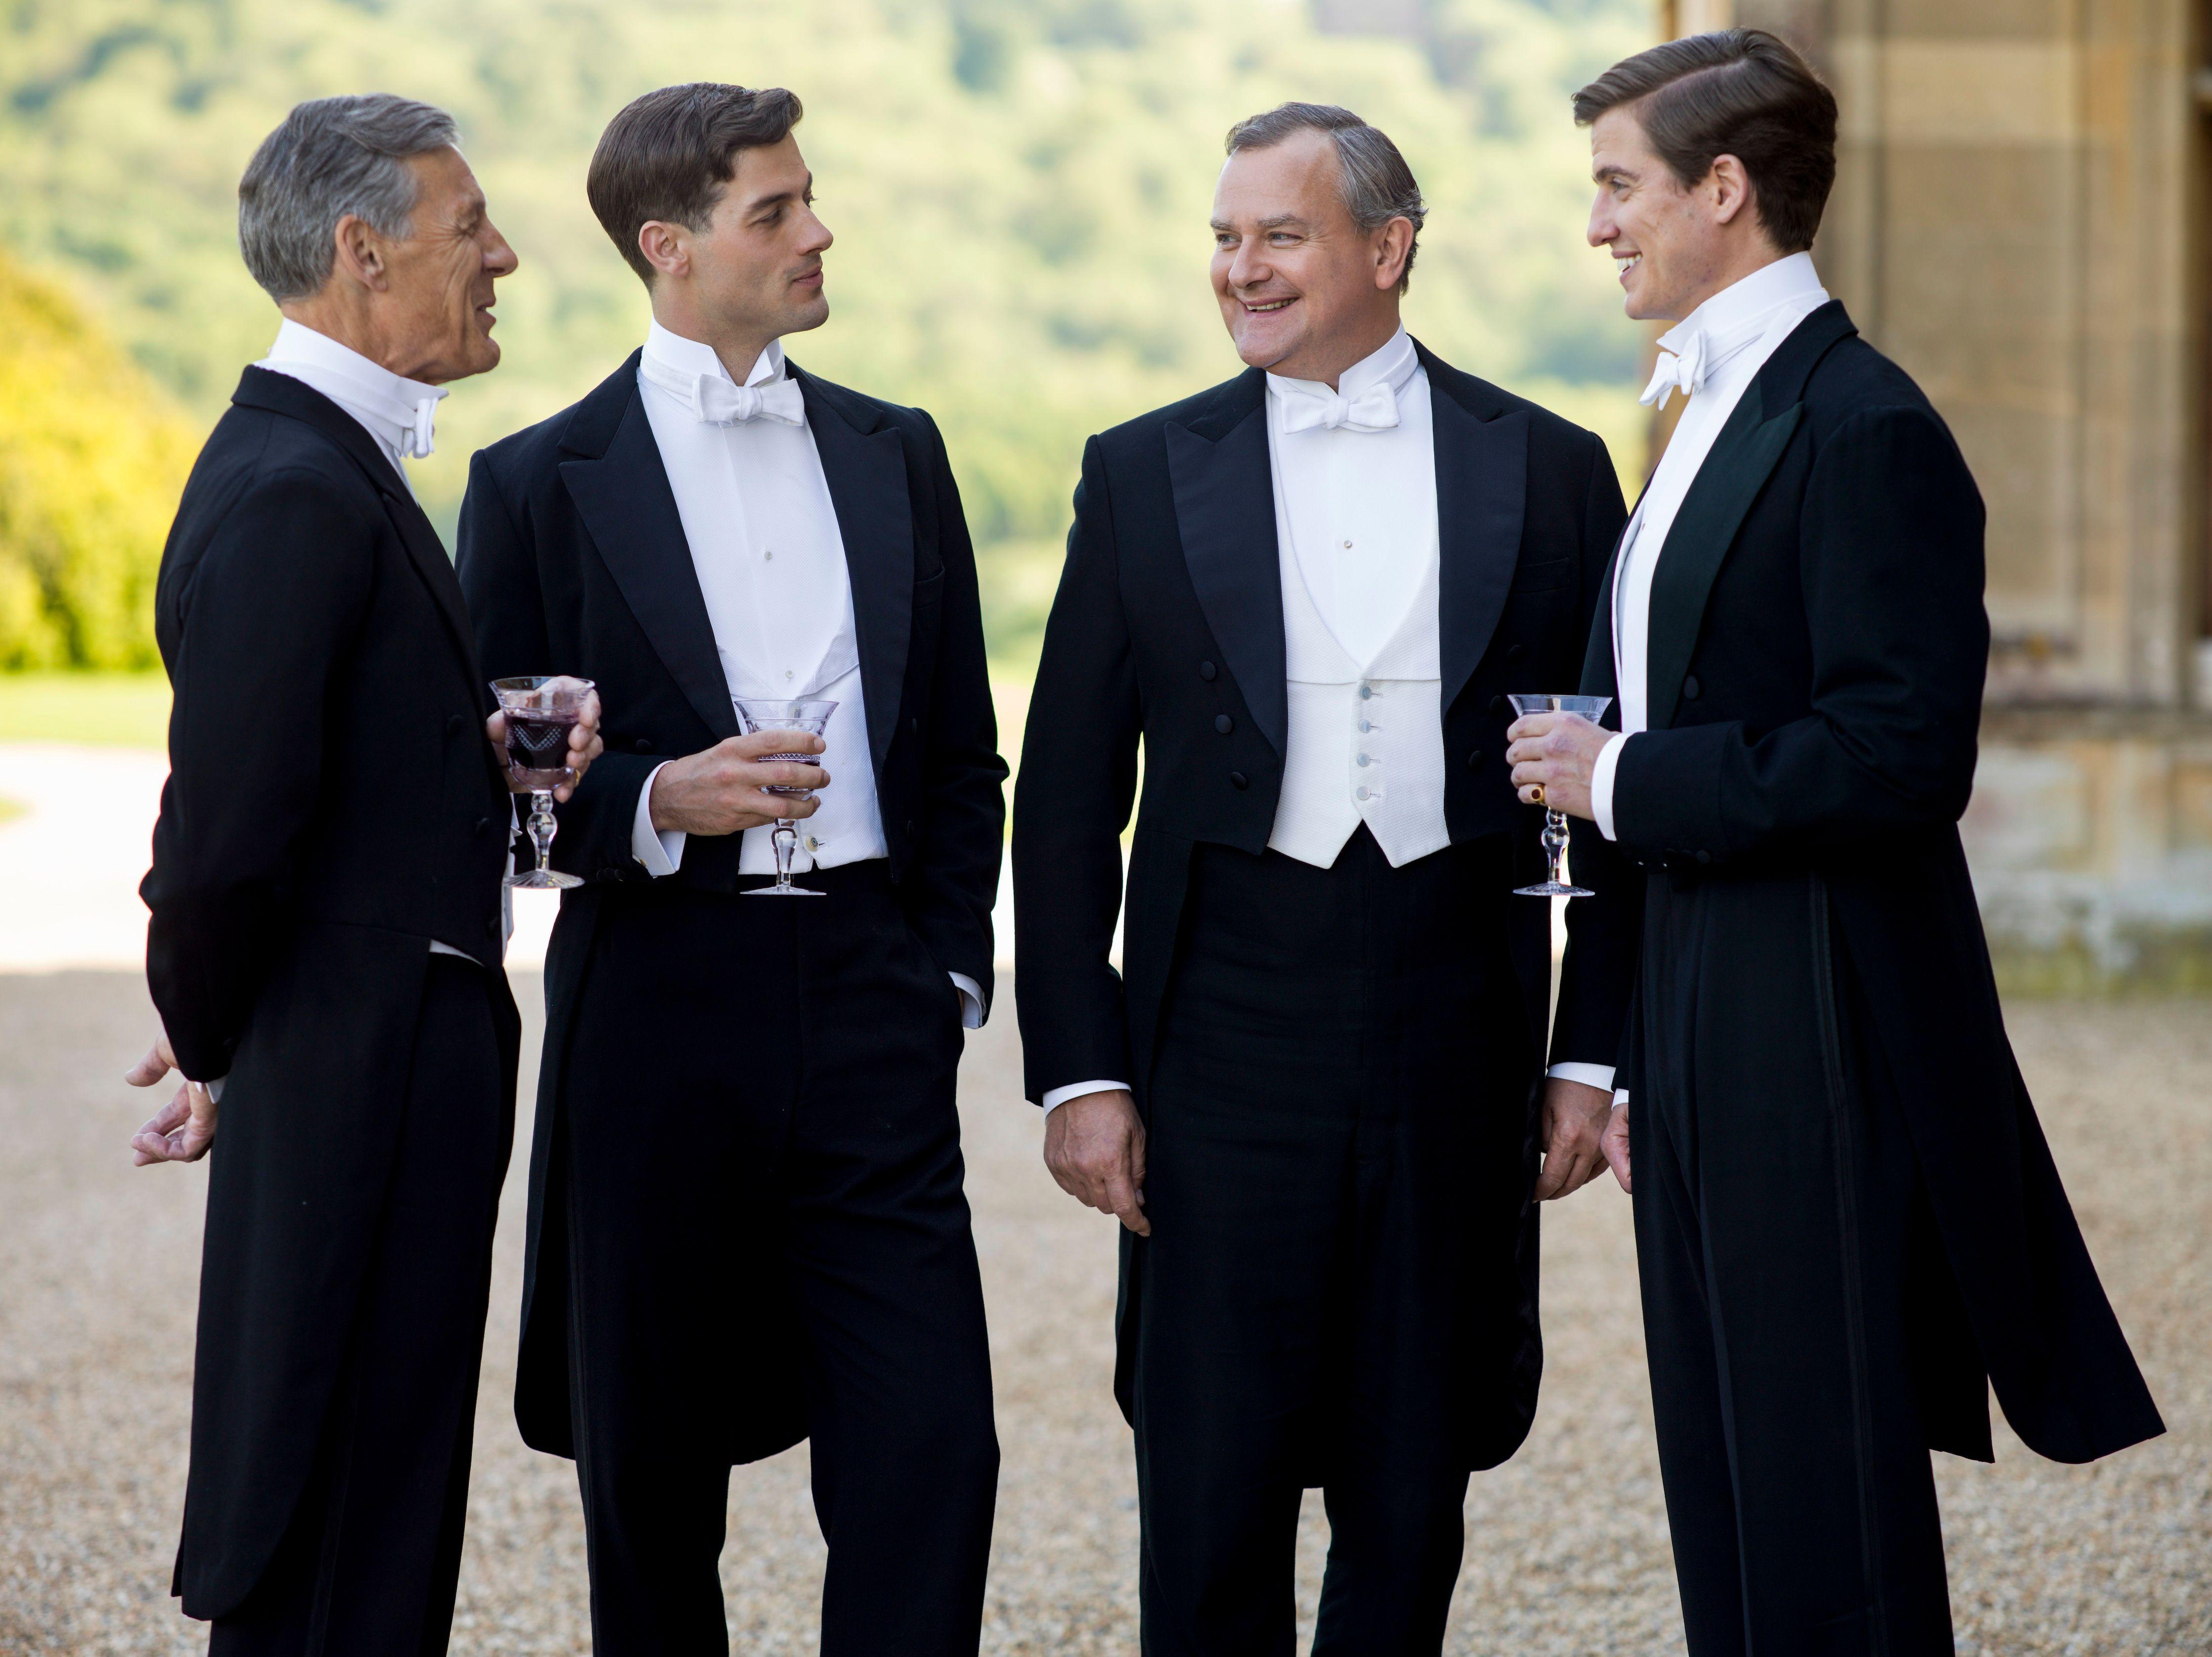 La Complex Season 1 Episode 7 Downton Abbey Season Episode Image